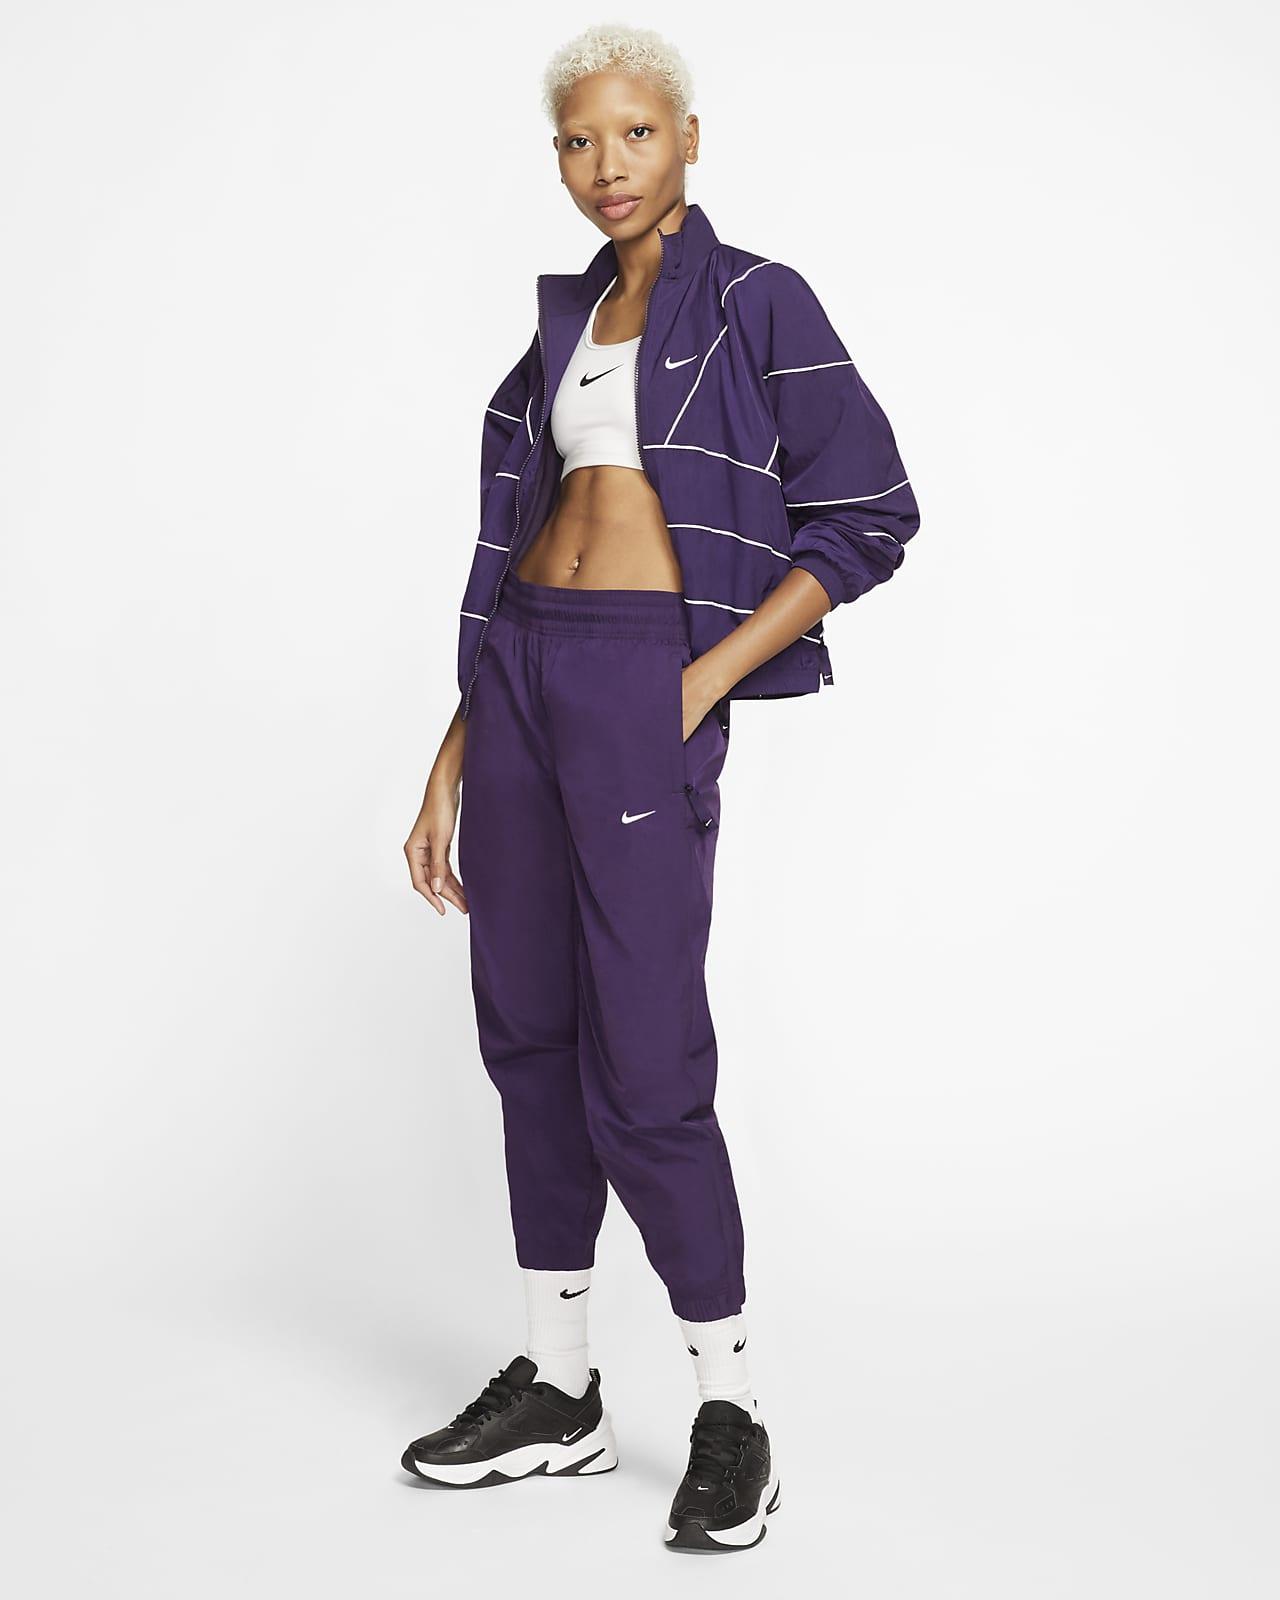 raspador Disfraces comedia  Nike Women's Track Pants. Nike.com